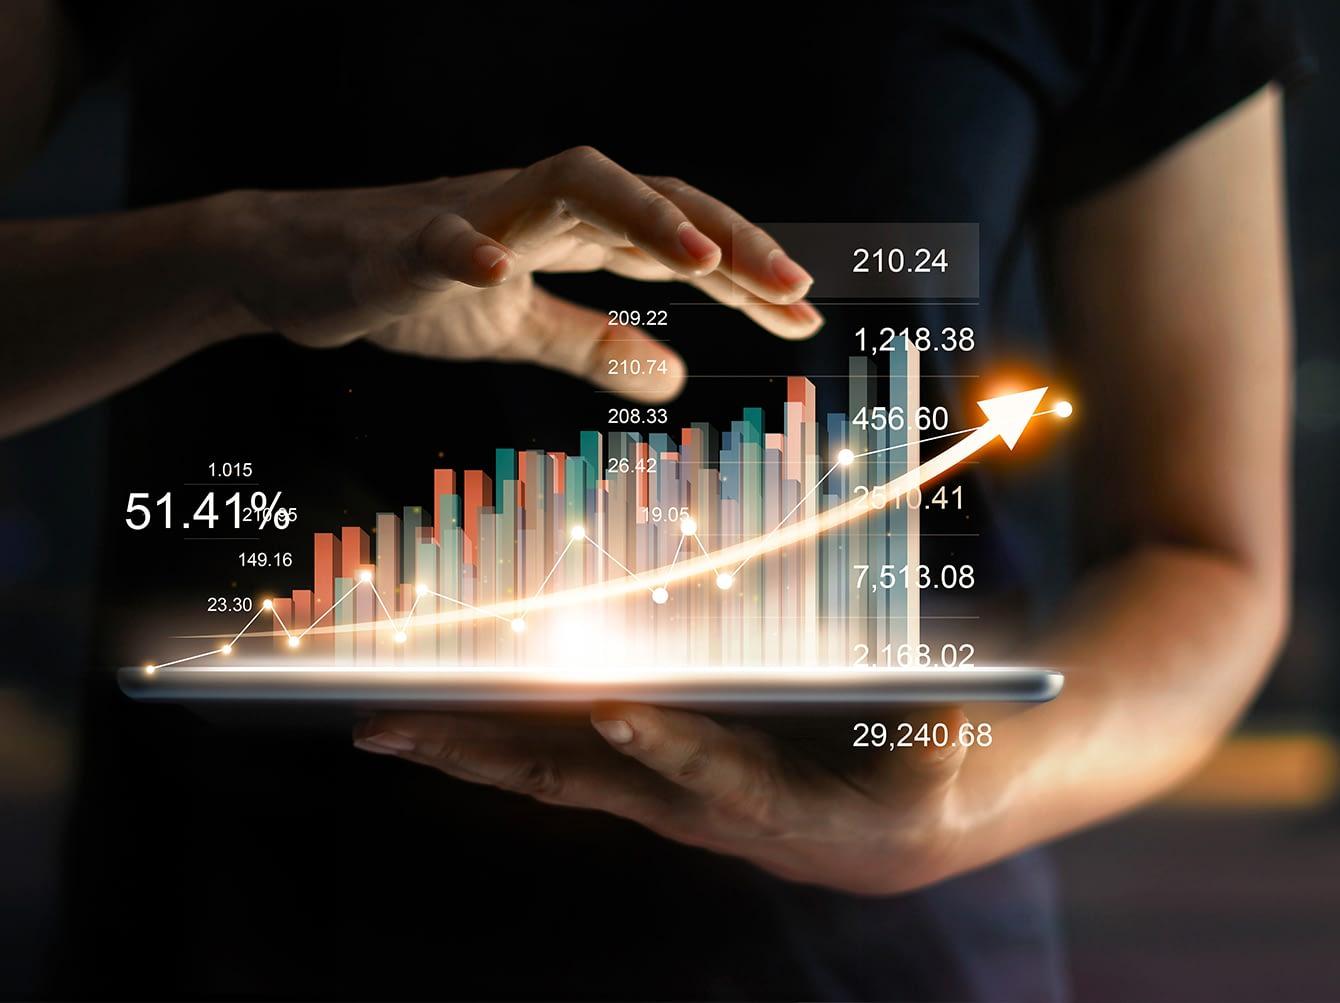 Digital Marketing - Why You Need A Marketing Strategy Image